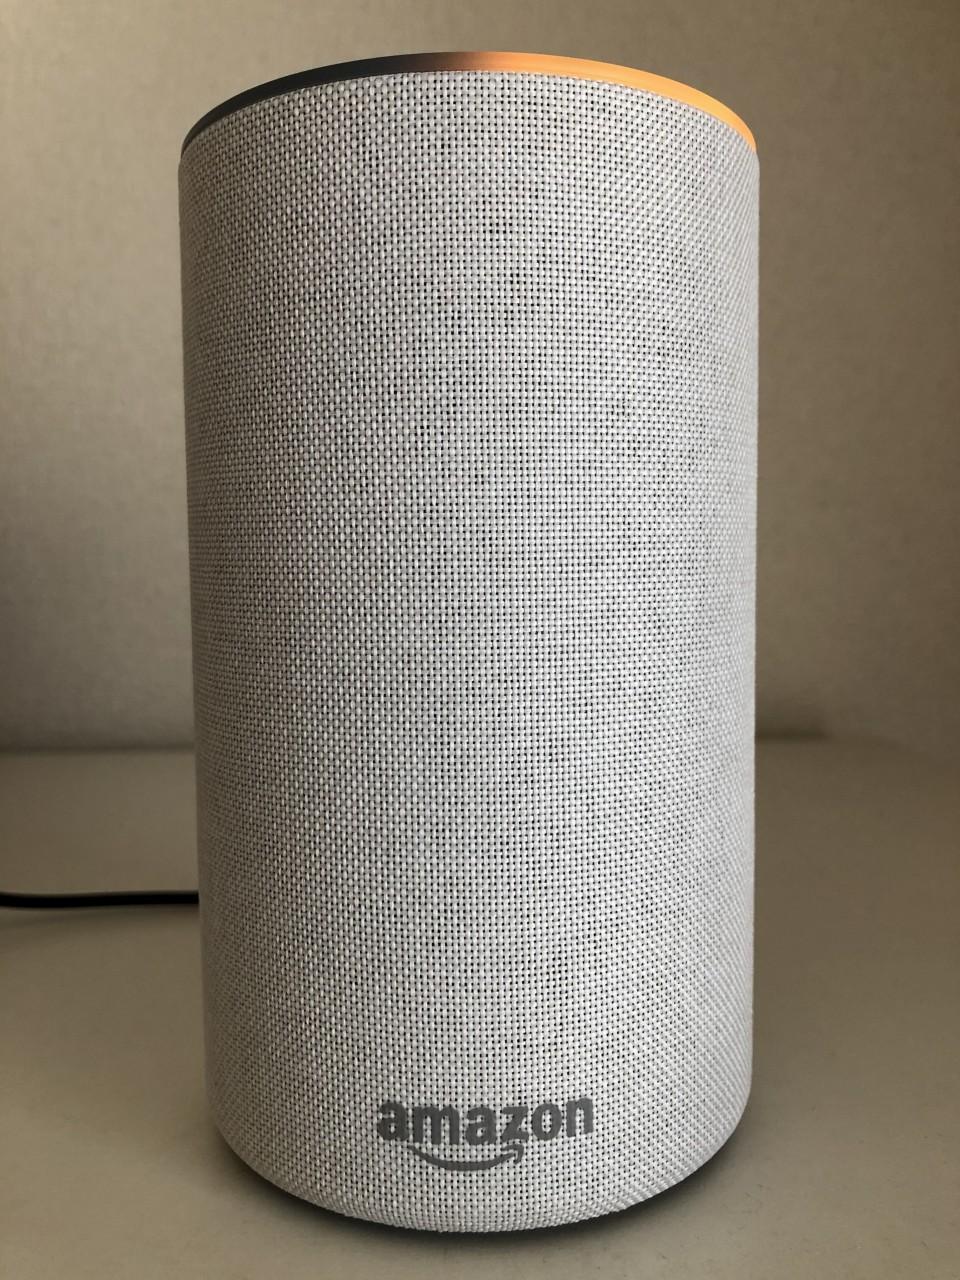 Amazon Echo動作中の本体